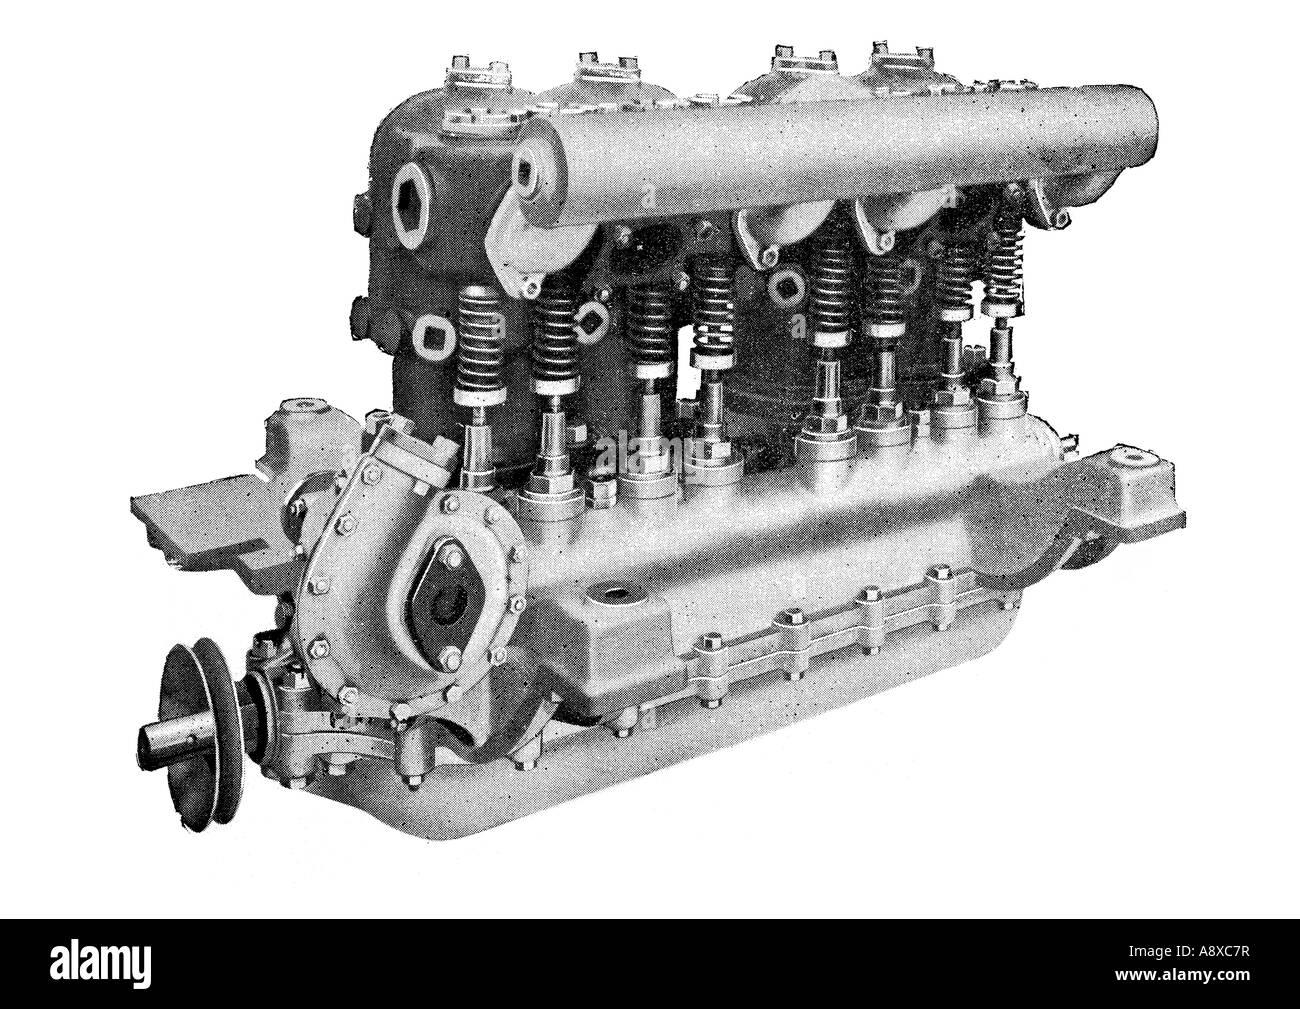 hight resolution of diagram of argyll 4 6 horse power petrol car engine stock image